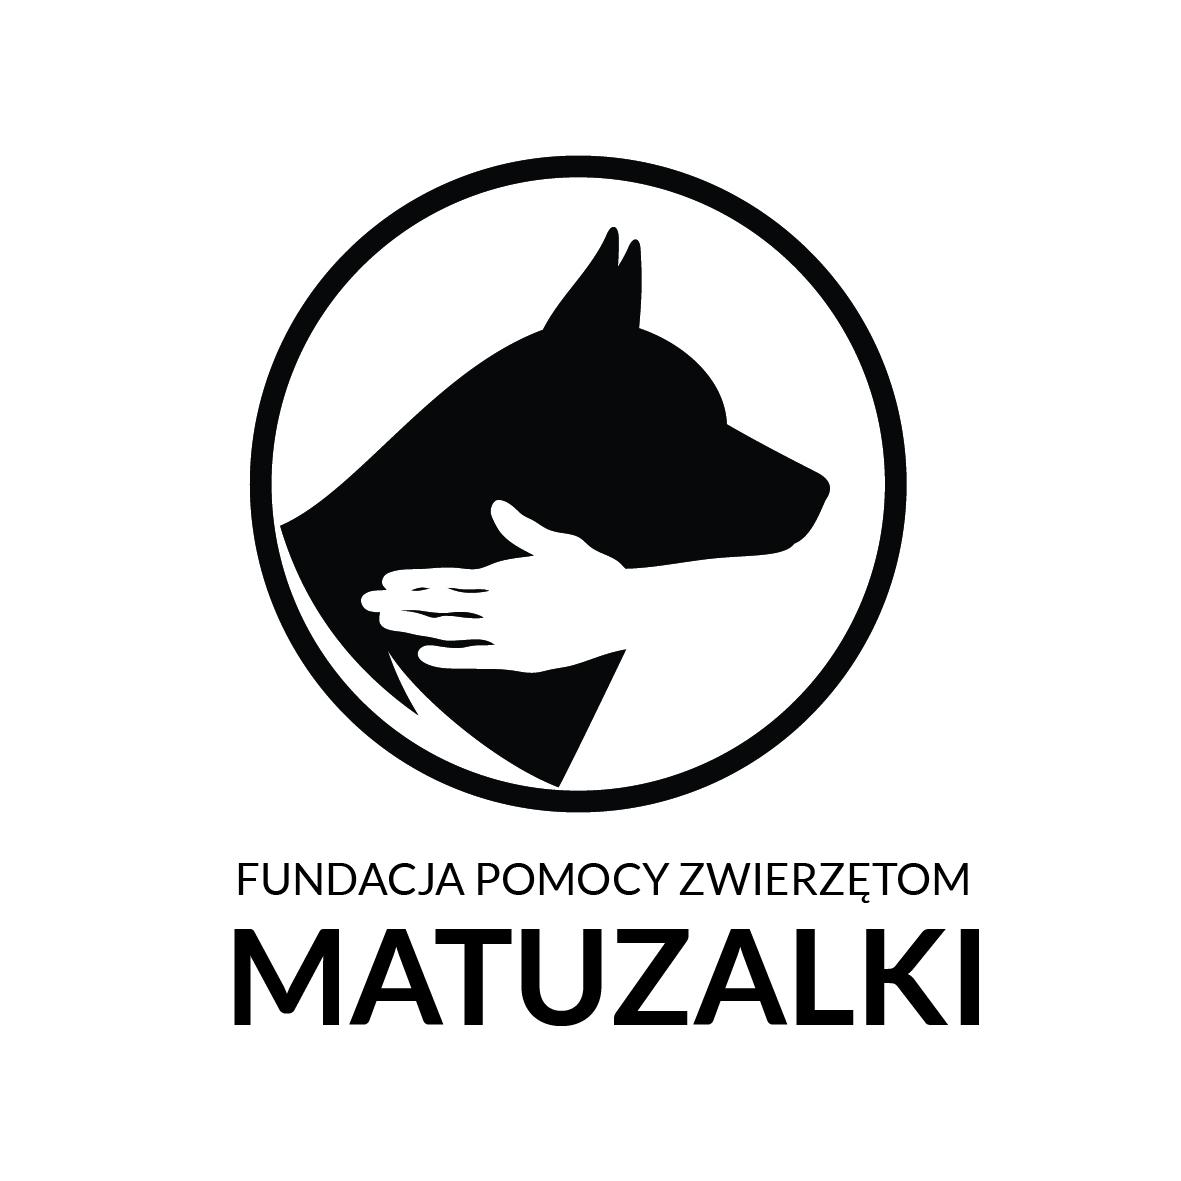 Matuzalki